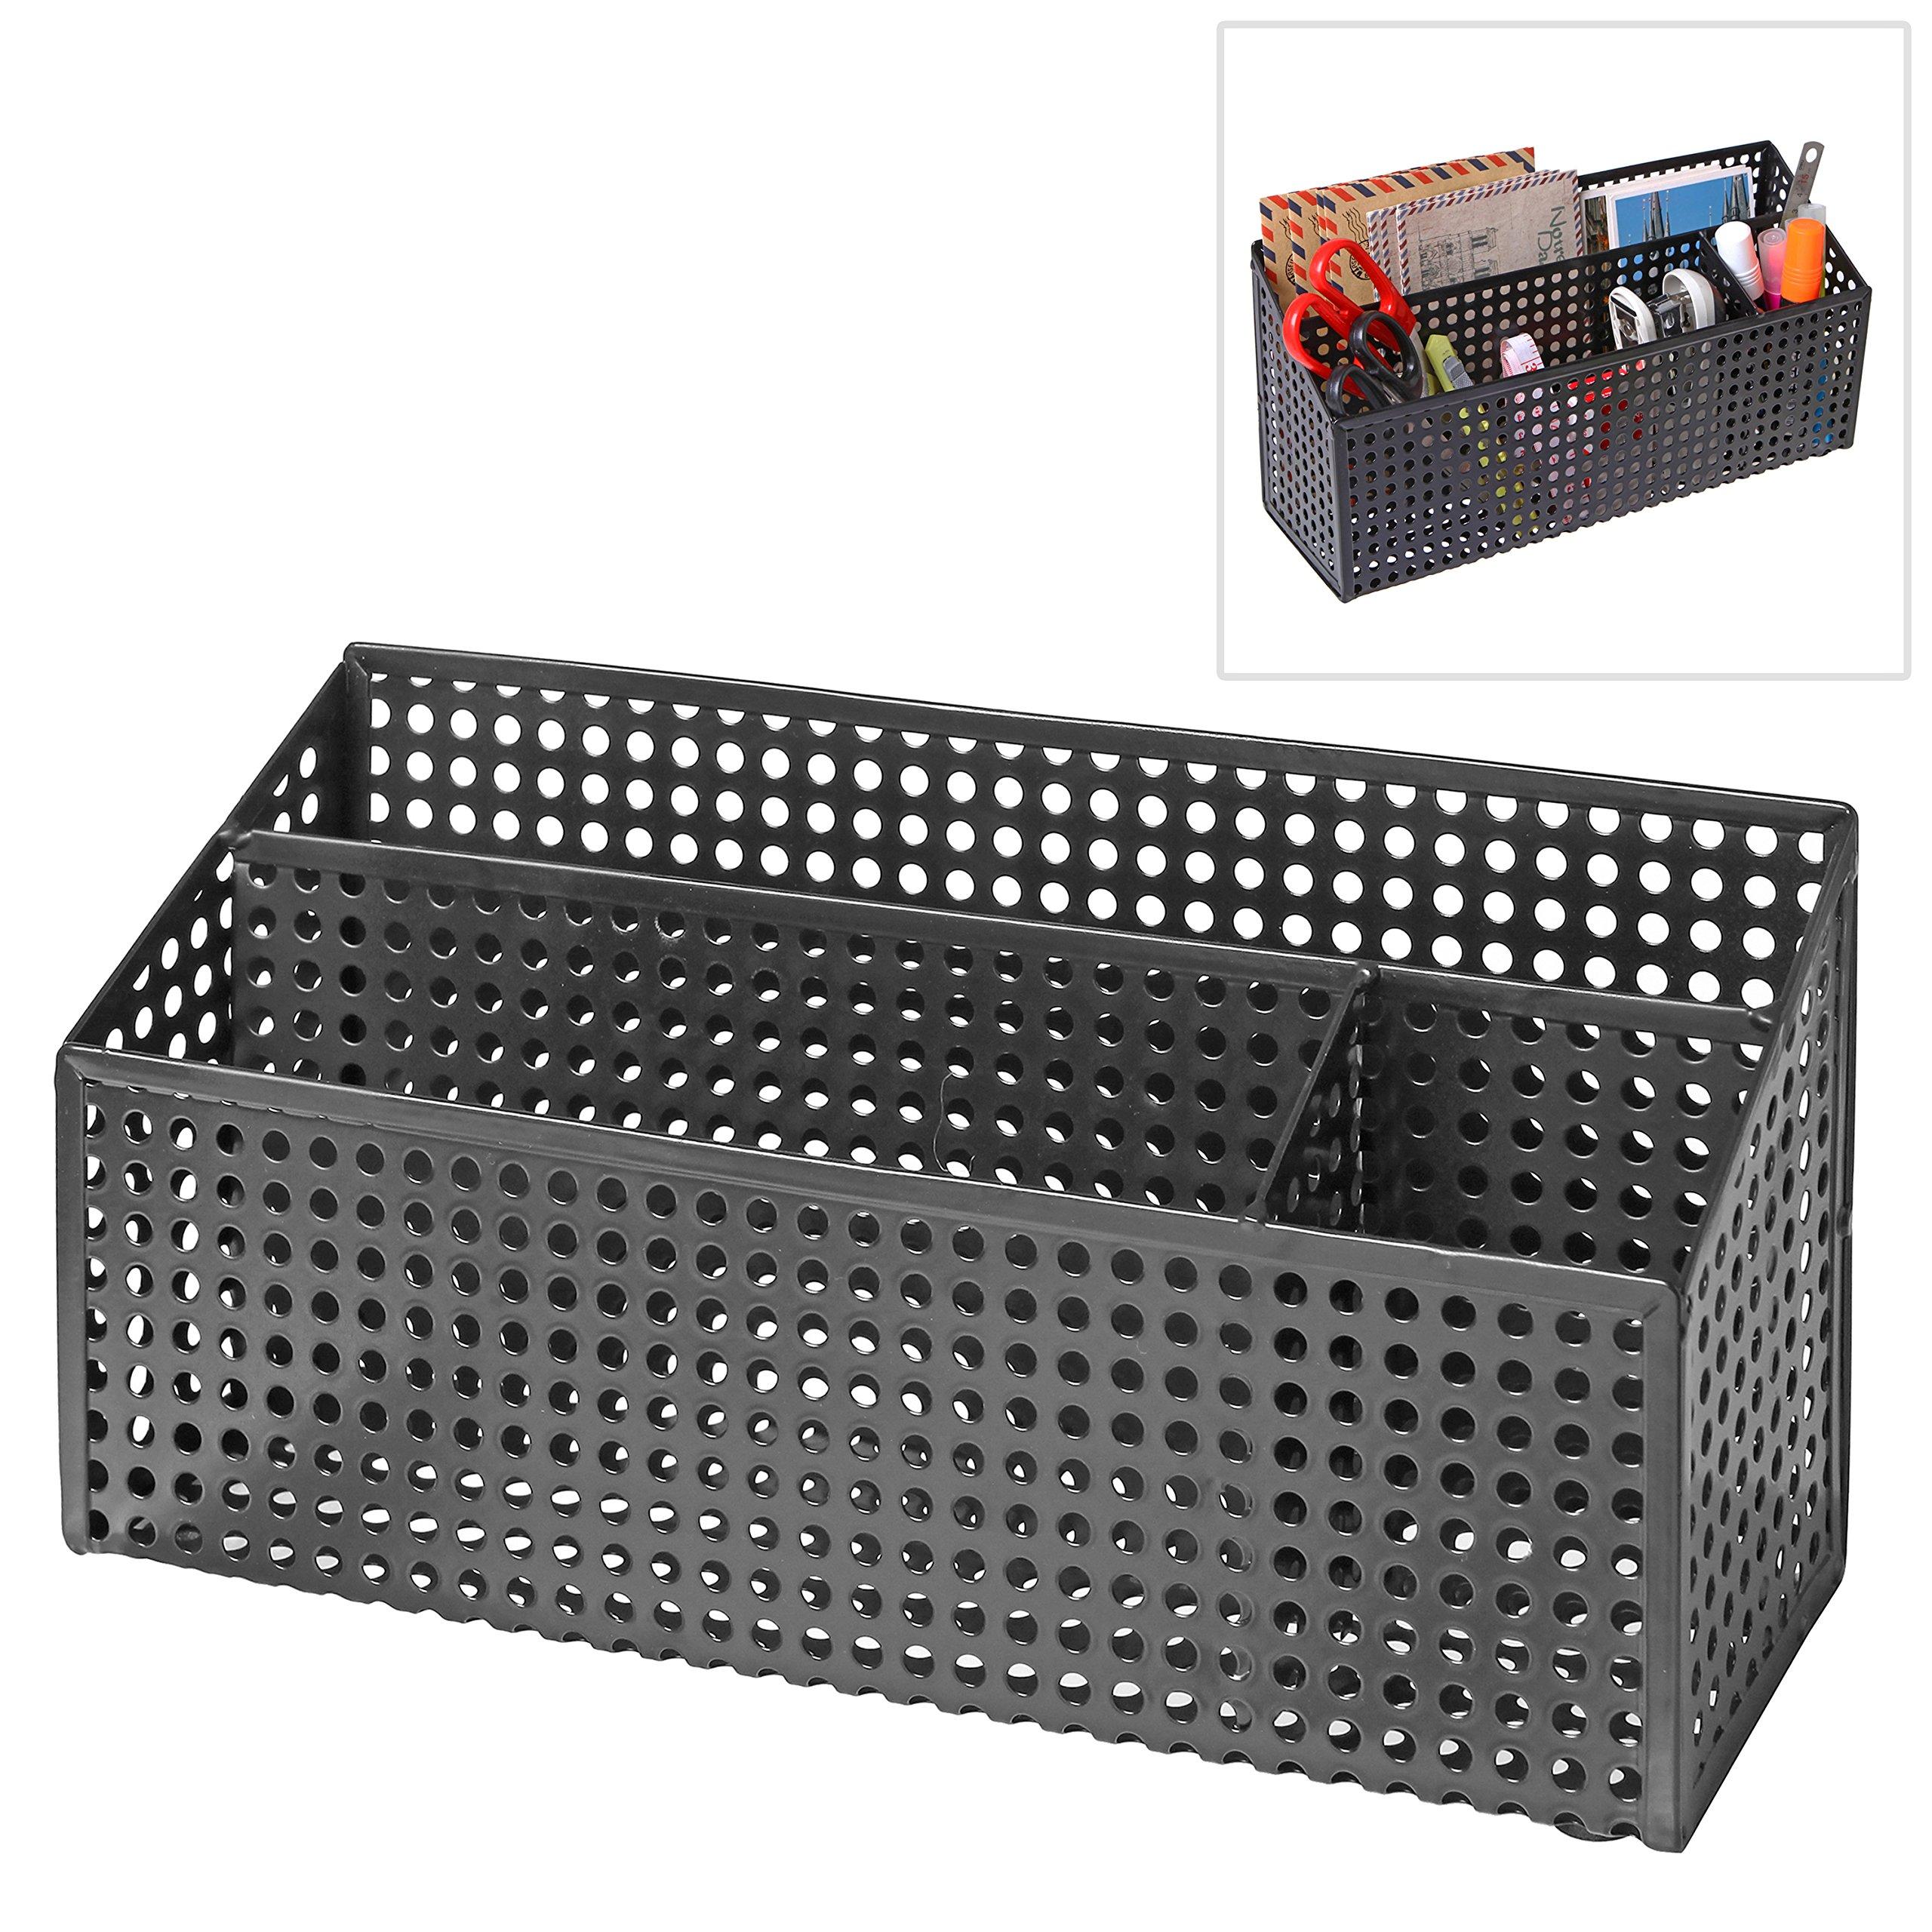 3-Compartment Modern Black Metal Desk Office Supply Holder & Mail Sorter w/ Perforated Design